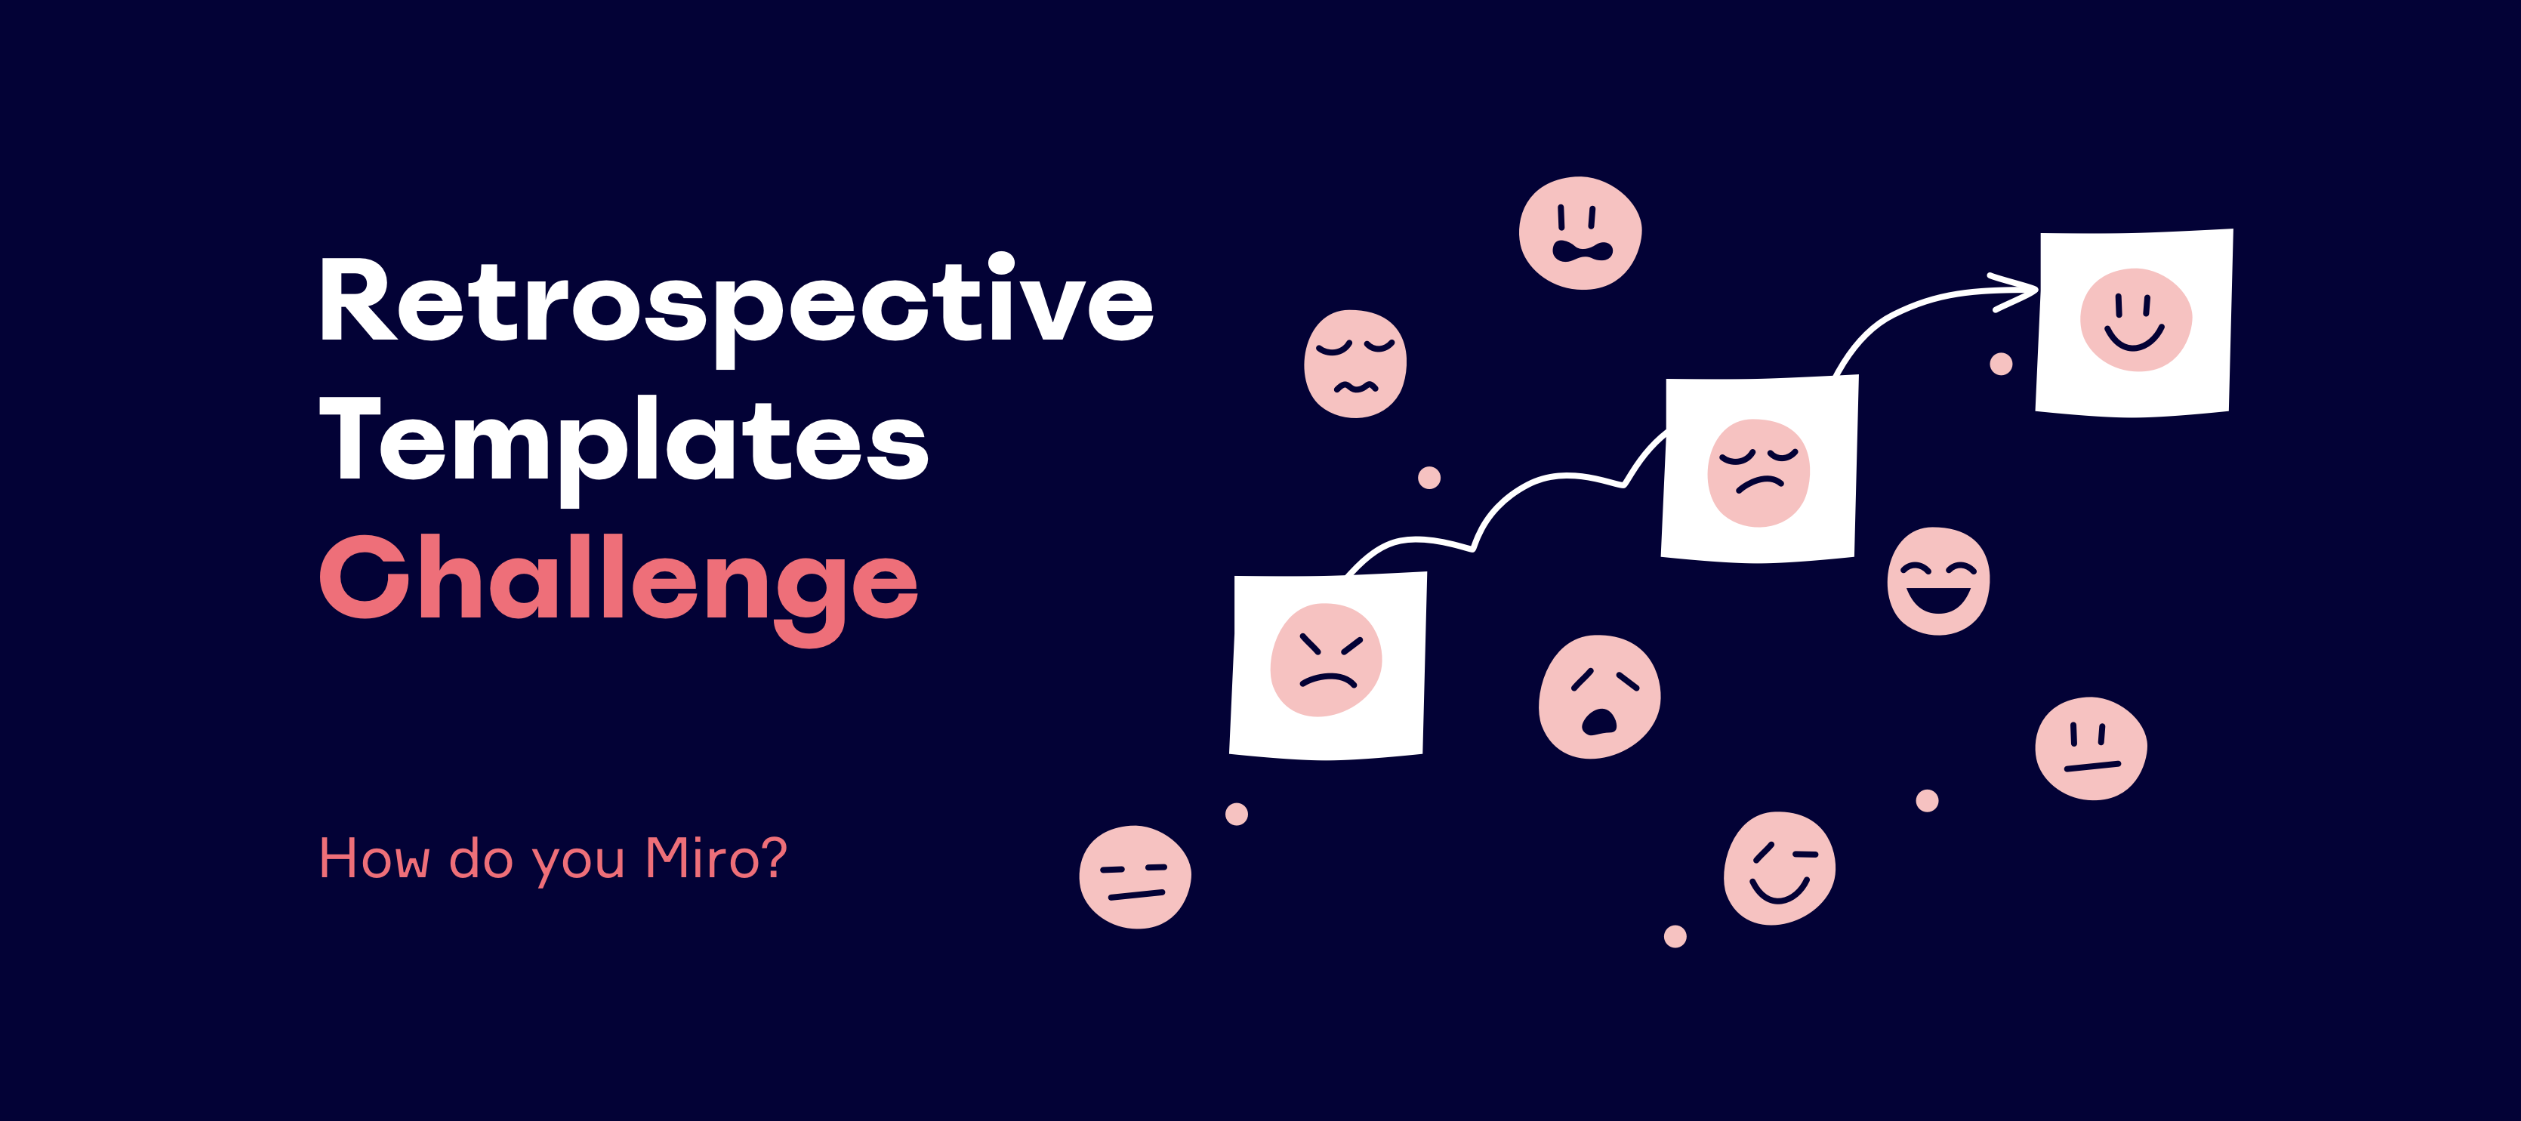 How Do You Miro? Retrospective Templates Challenge 🔮